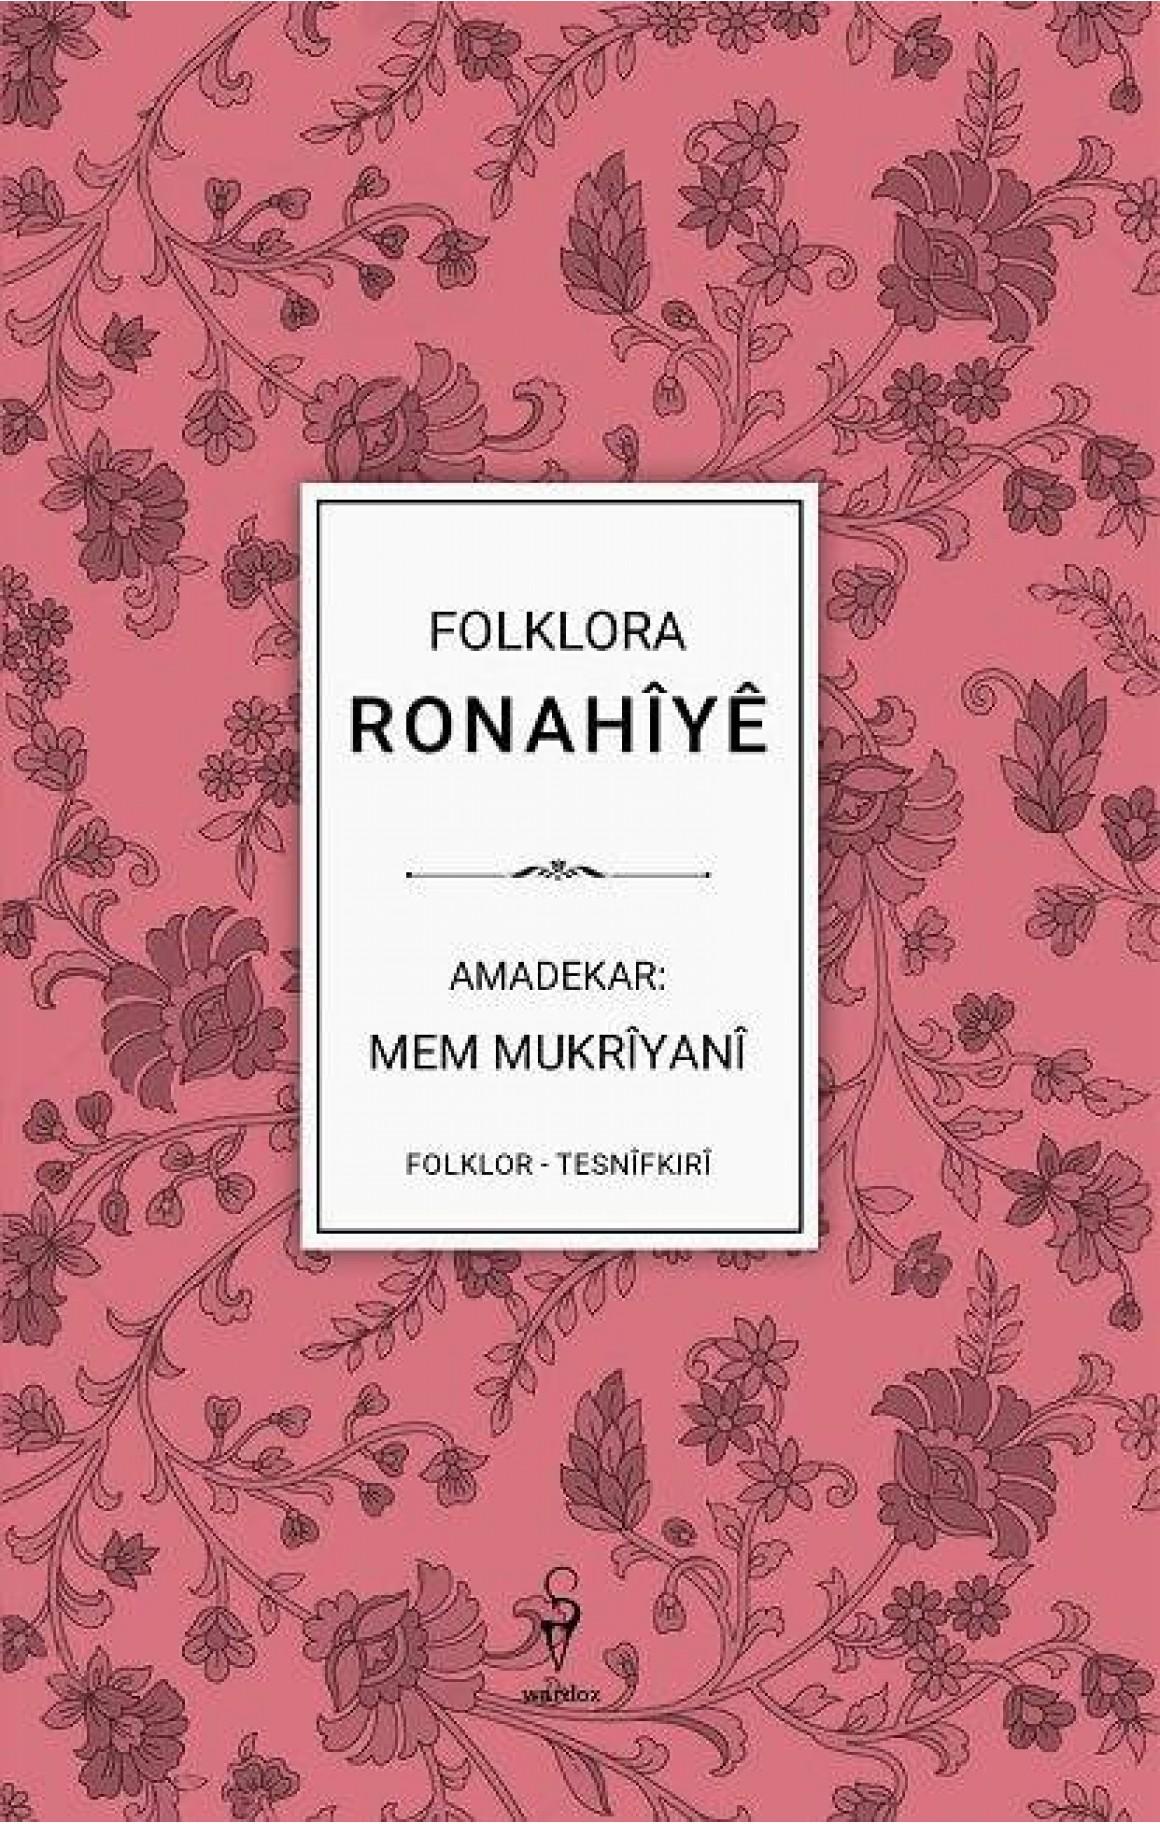 Folklora Ronahîyê